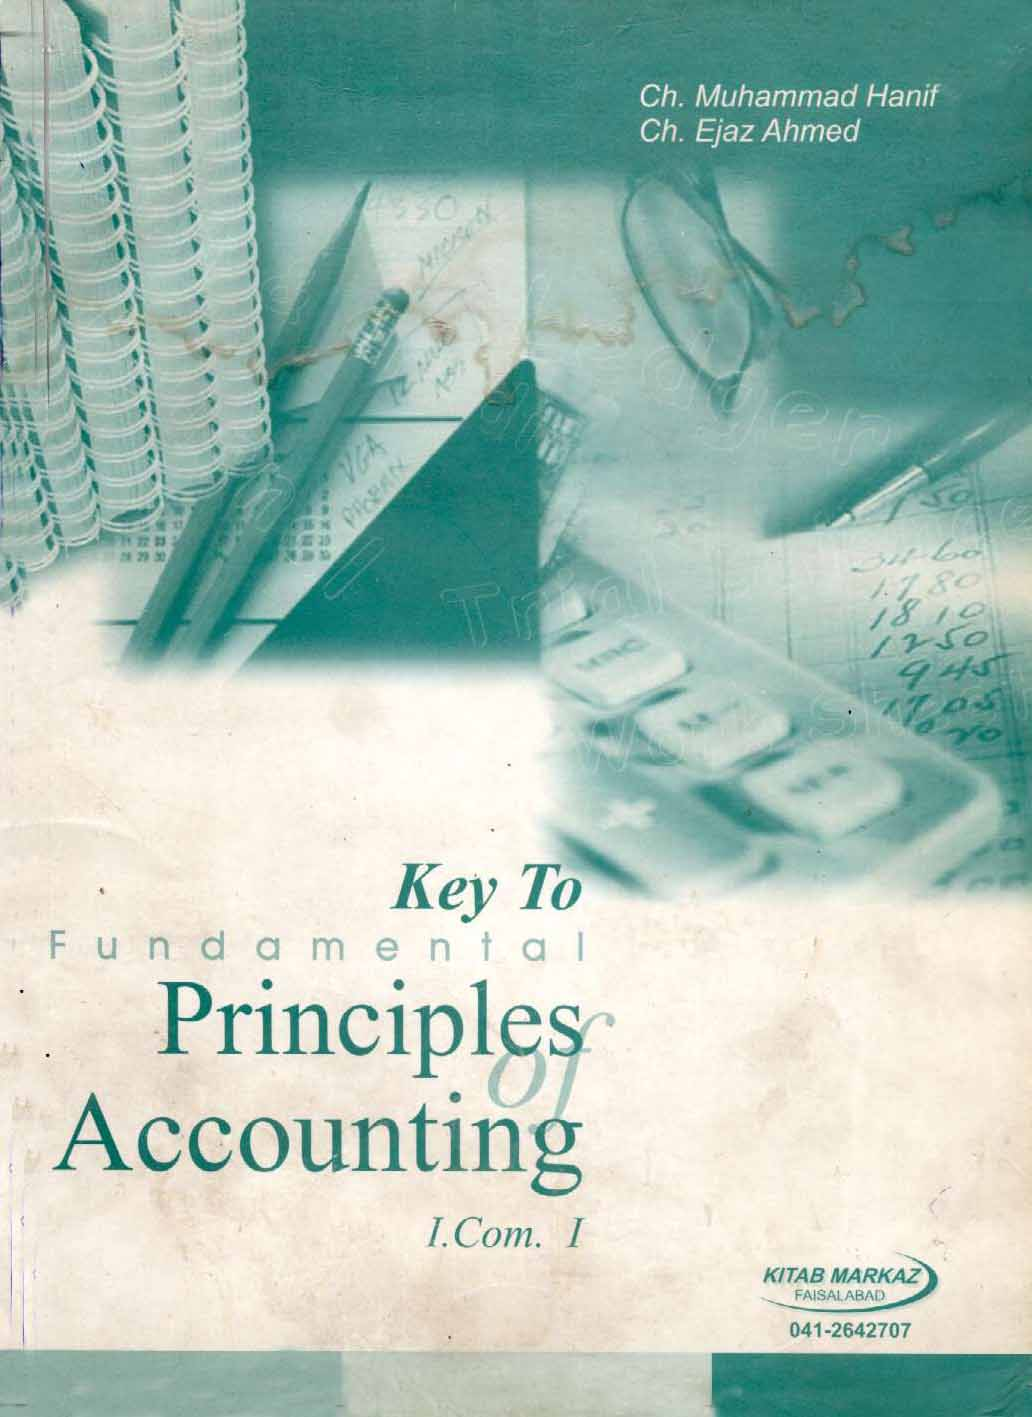 rinciples of Accounting I.Com